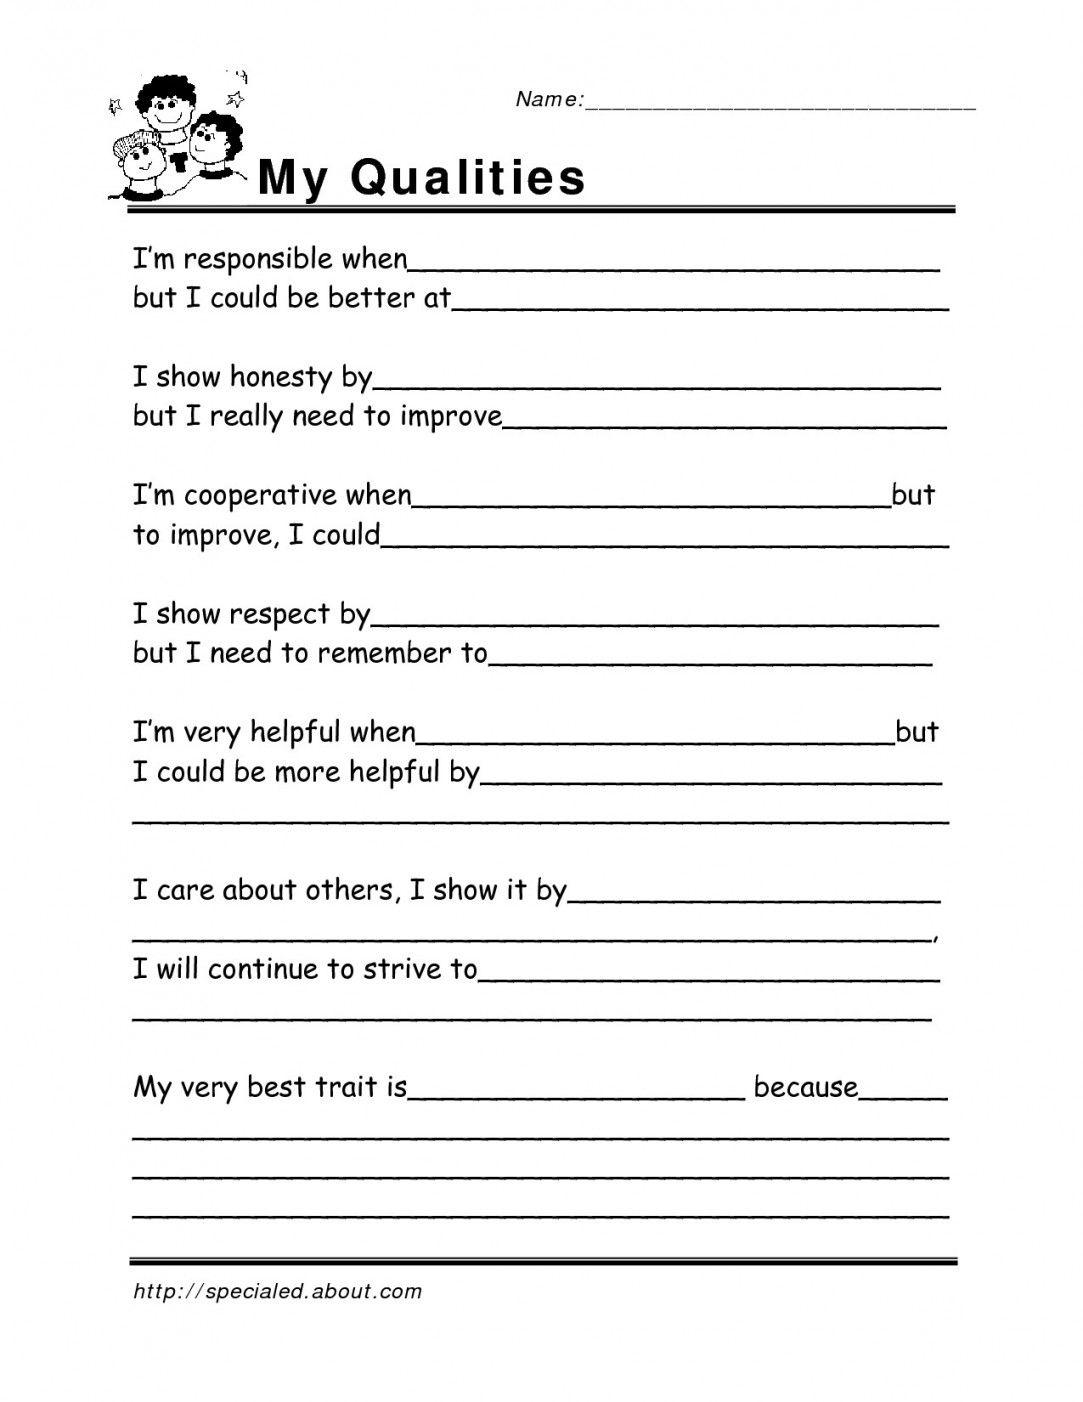 Free Printable Life Skills Worksheets | Lostranquillos - Free Printable Life Skills Worksheets